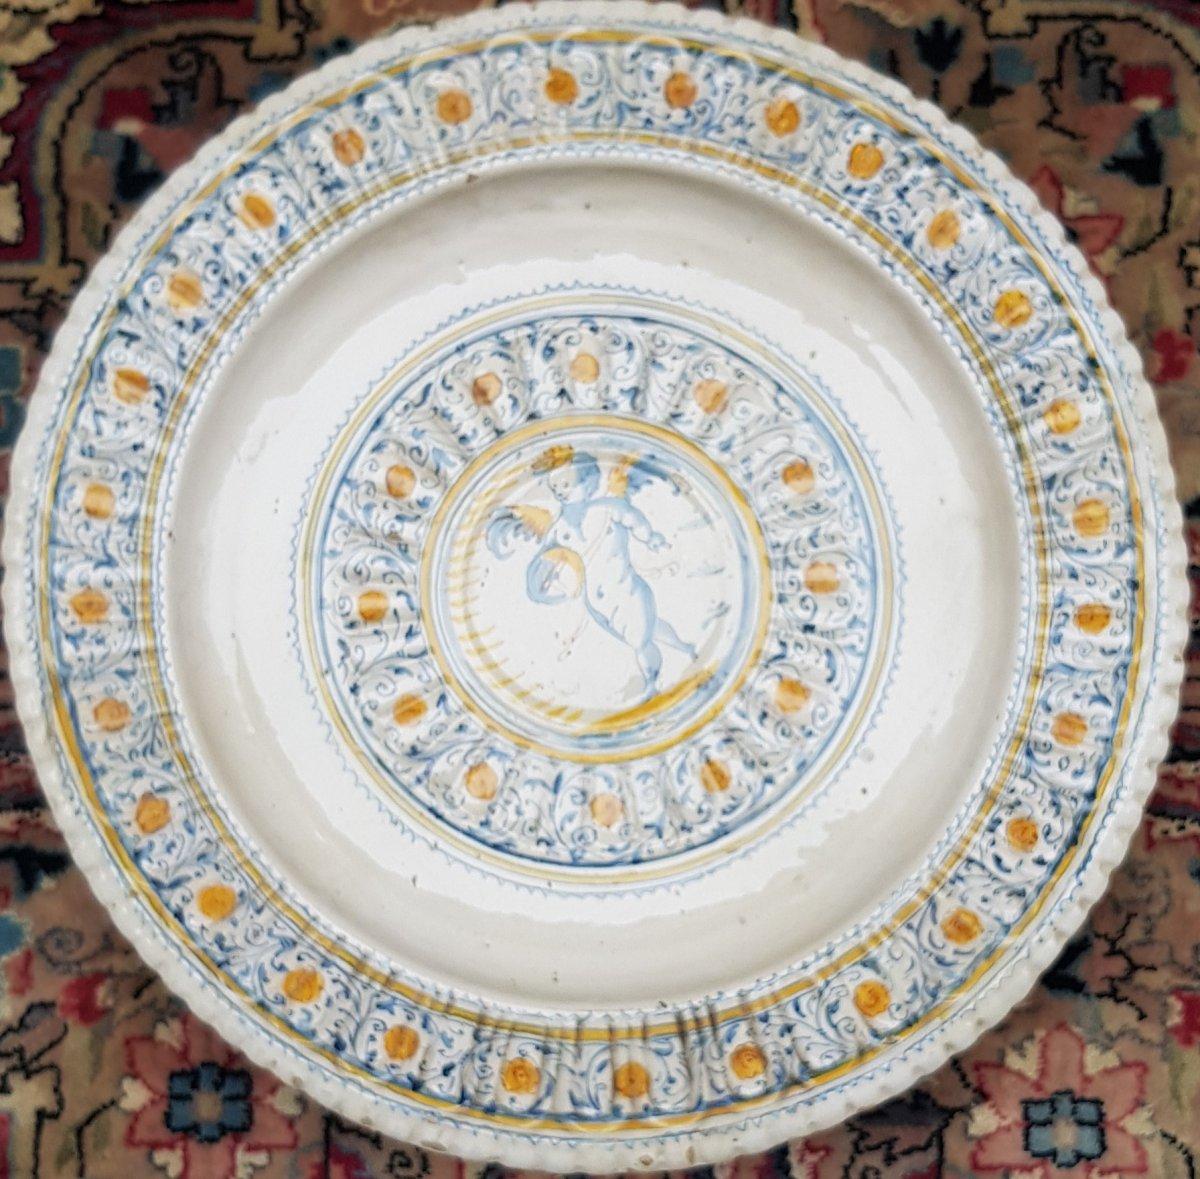 17th Century Majolica Dish